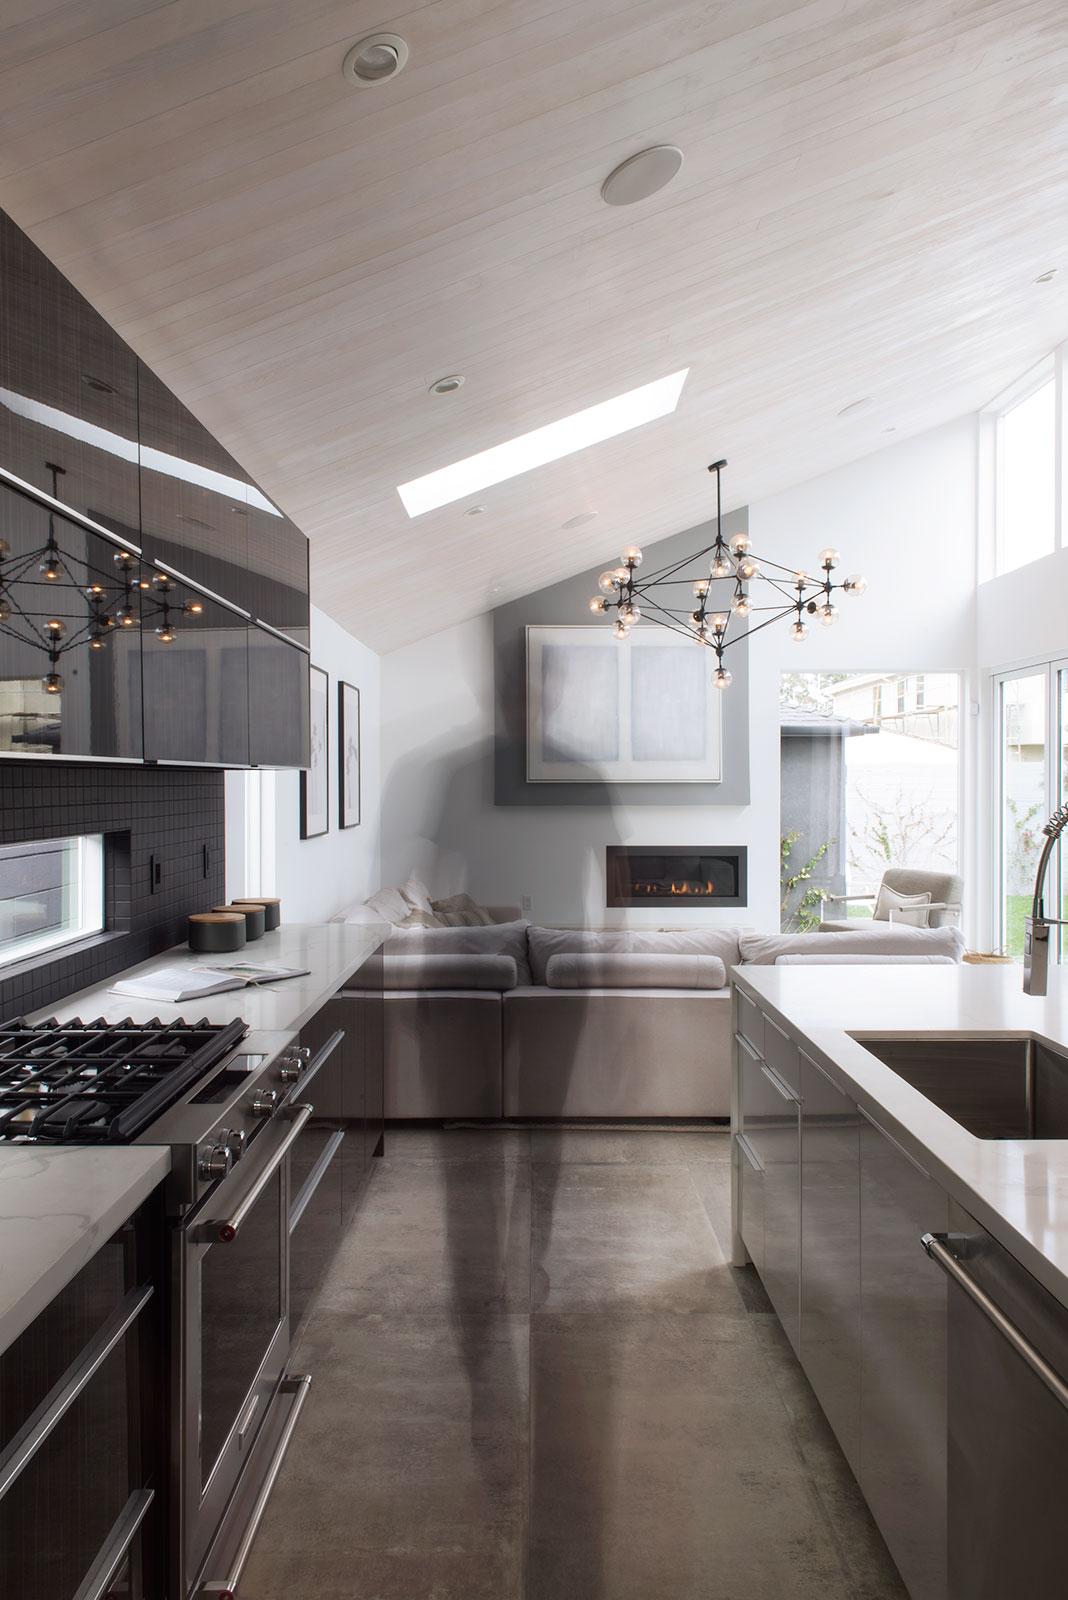 BEETHOVEN_interior_kitchen_01.jpg